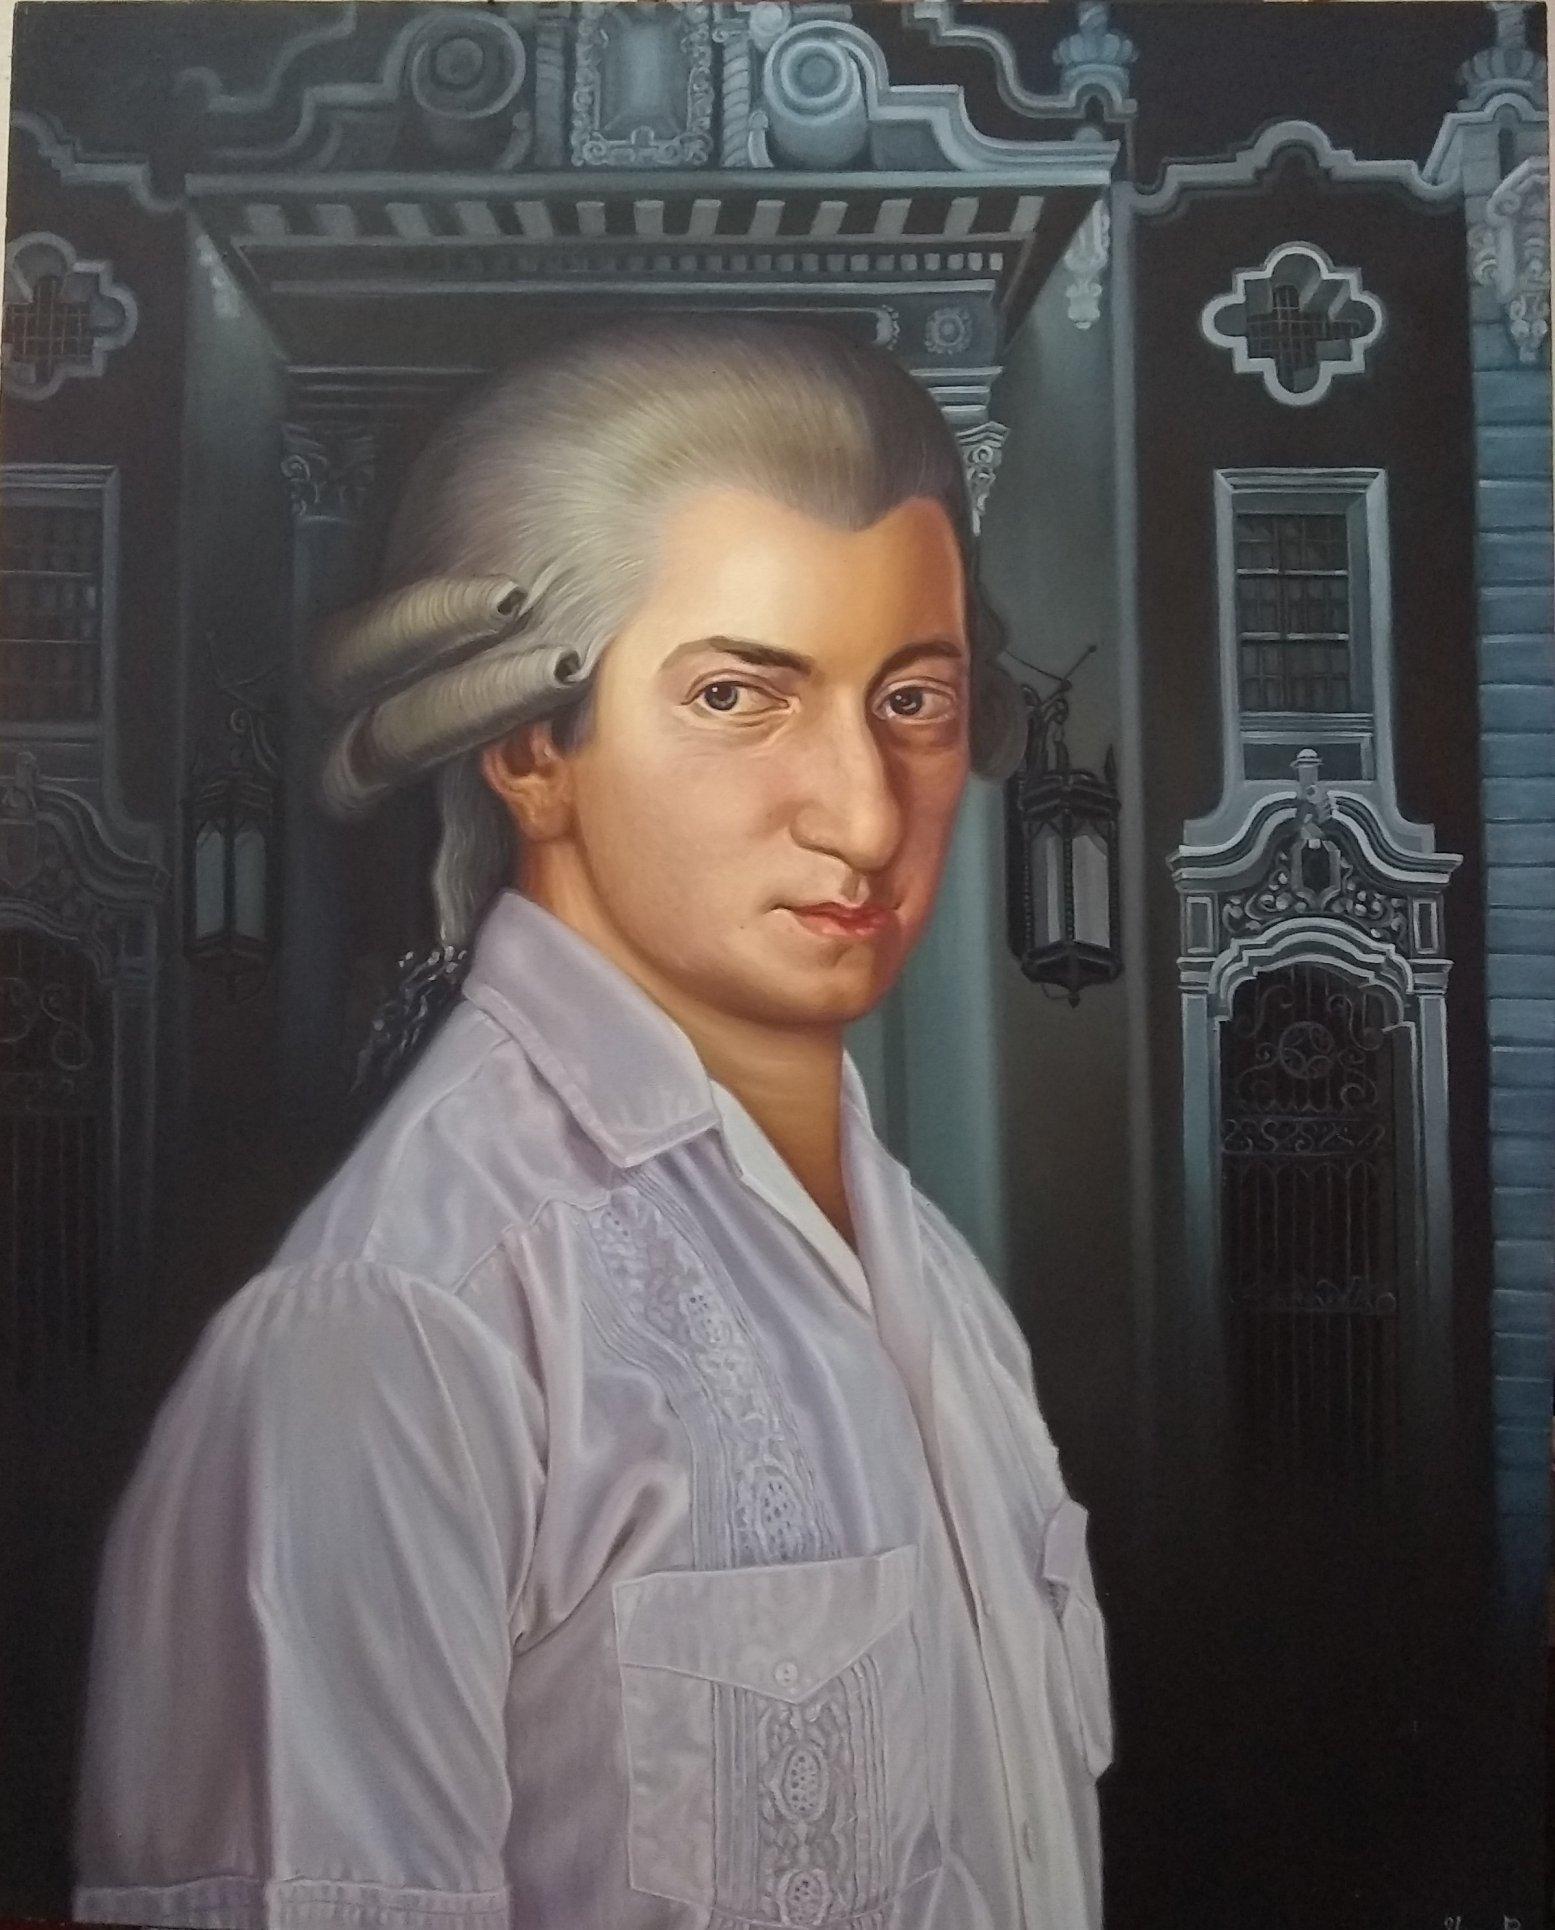 Mozart para Cuba (2017) - Yoandry Cáceres Rivero